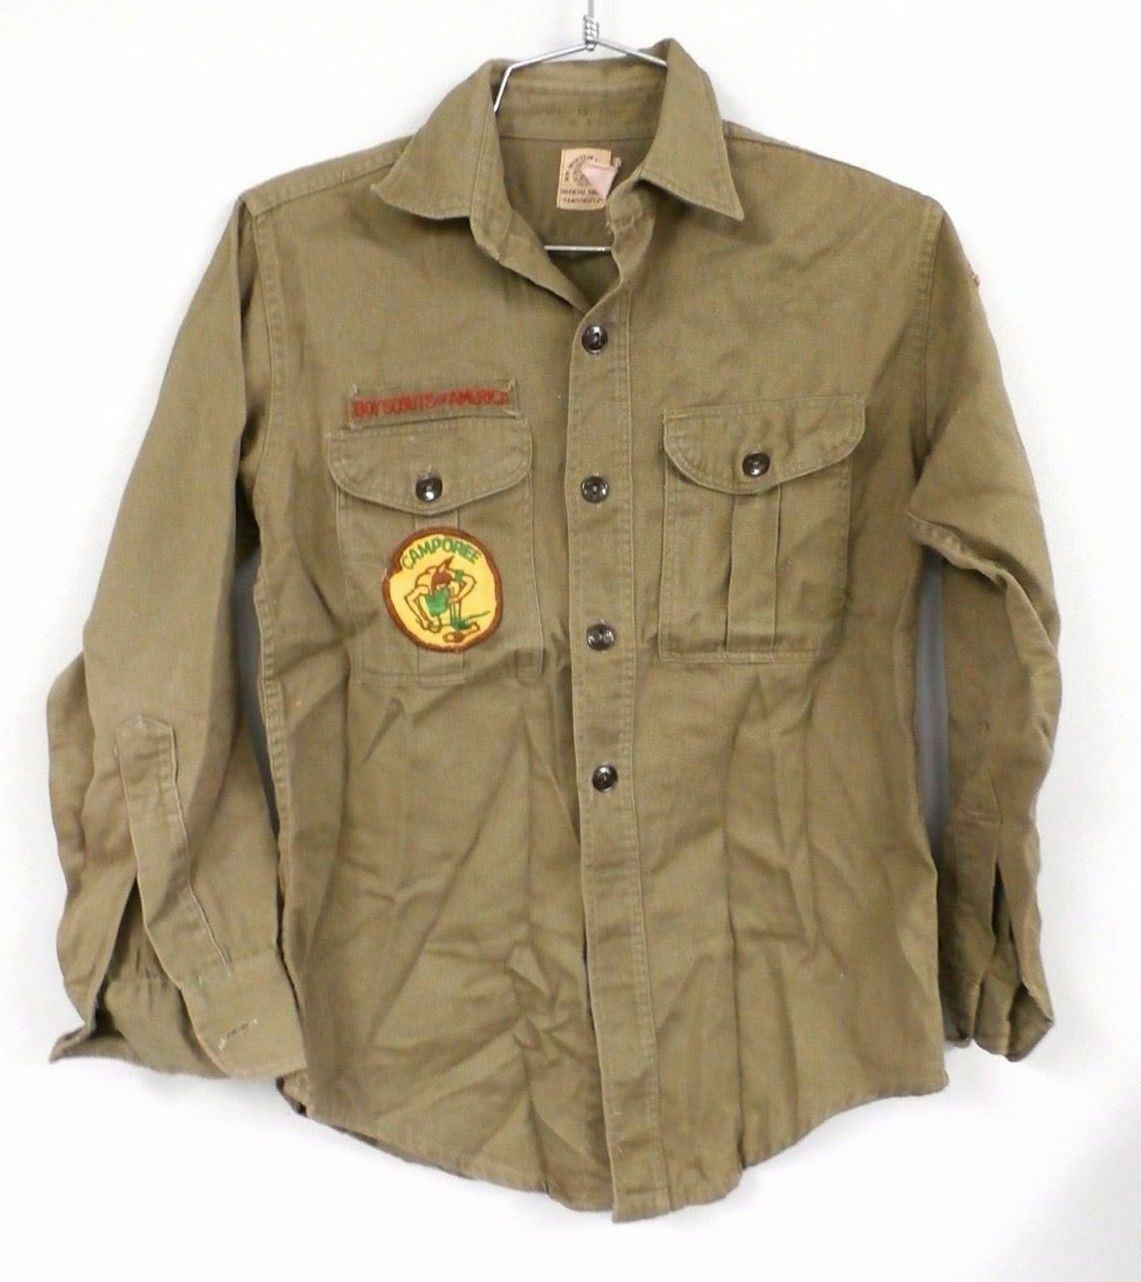 "Vtg 1960s Boy Scout of America BSA USA  Sanforized Patch Uniform Shirt Sz M 36"" - $42.77"